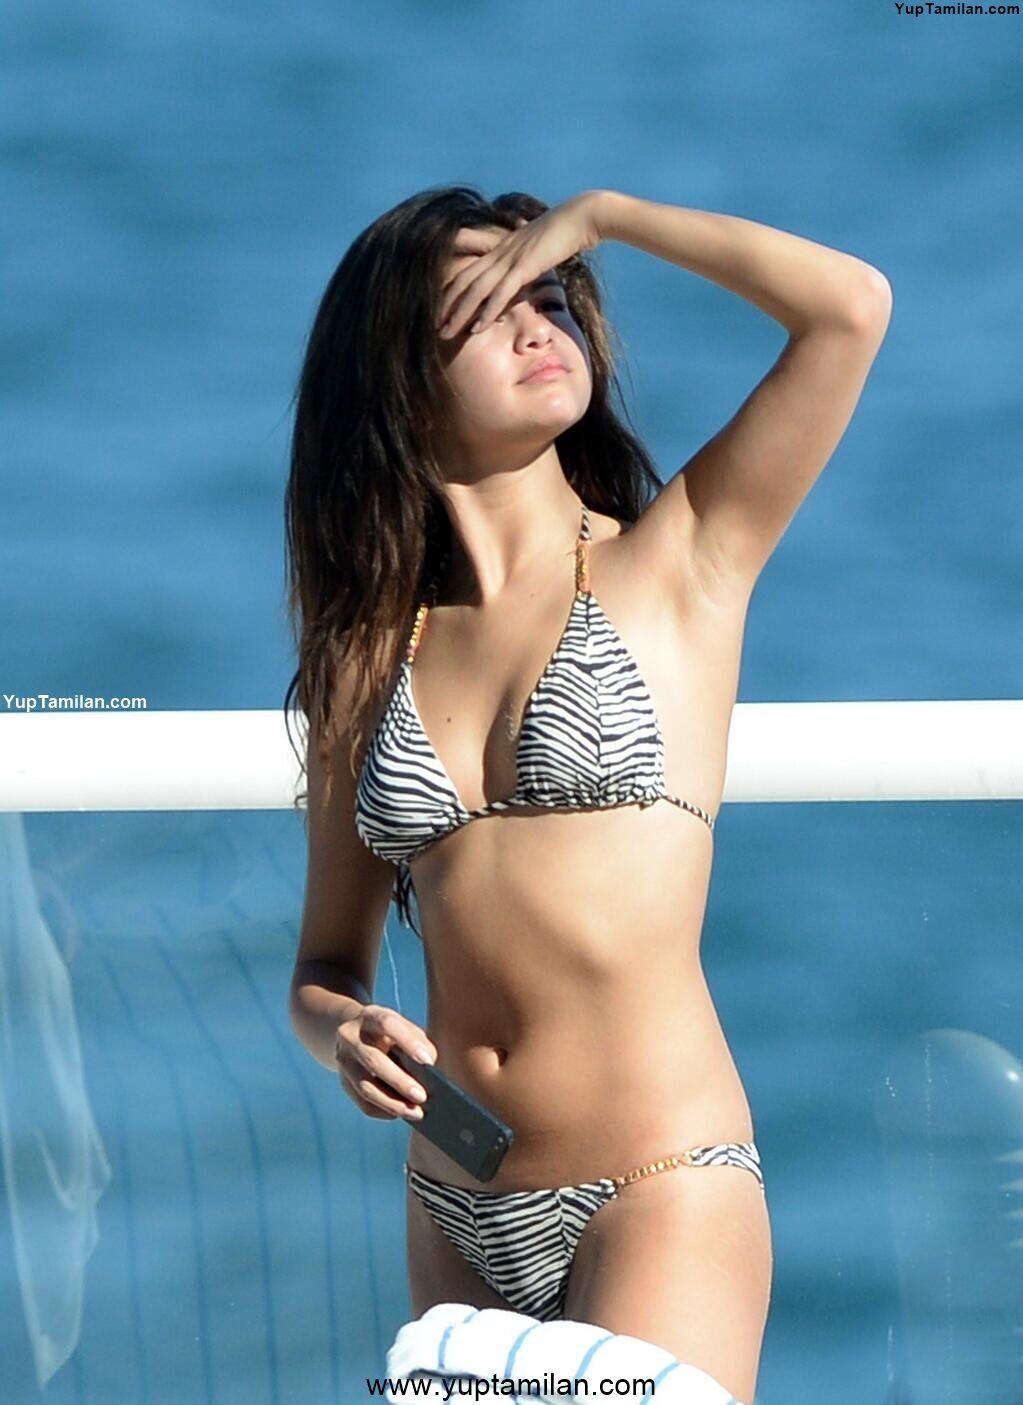 Selena Gomez hottest Swimwear & Bikini Pictures